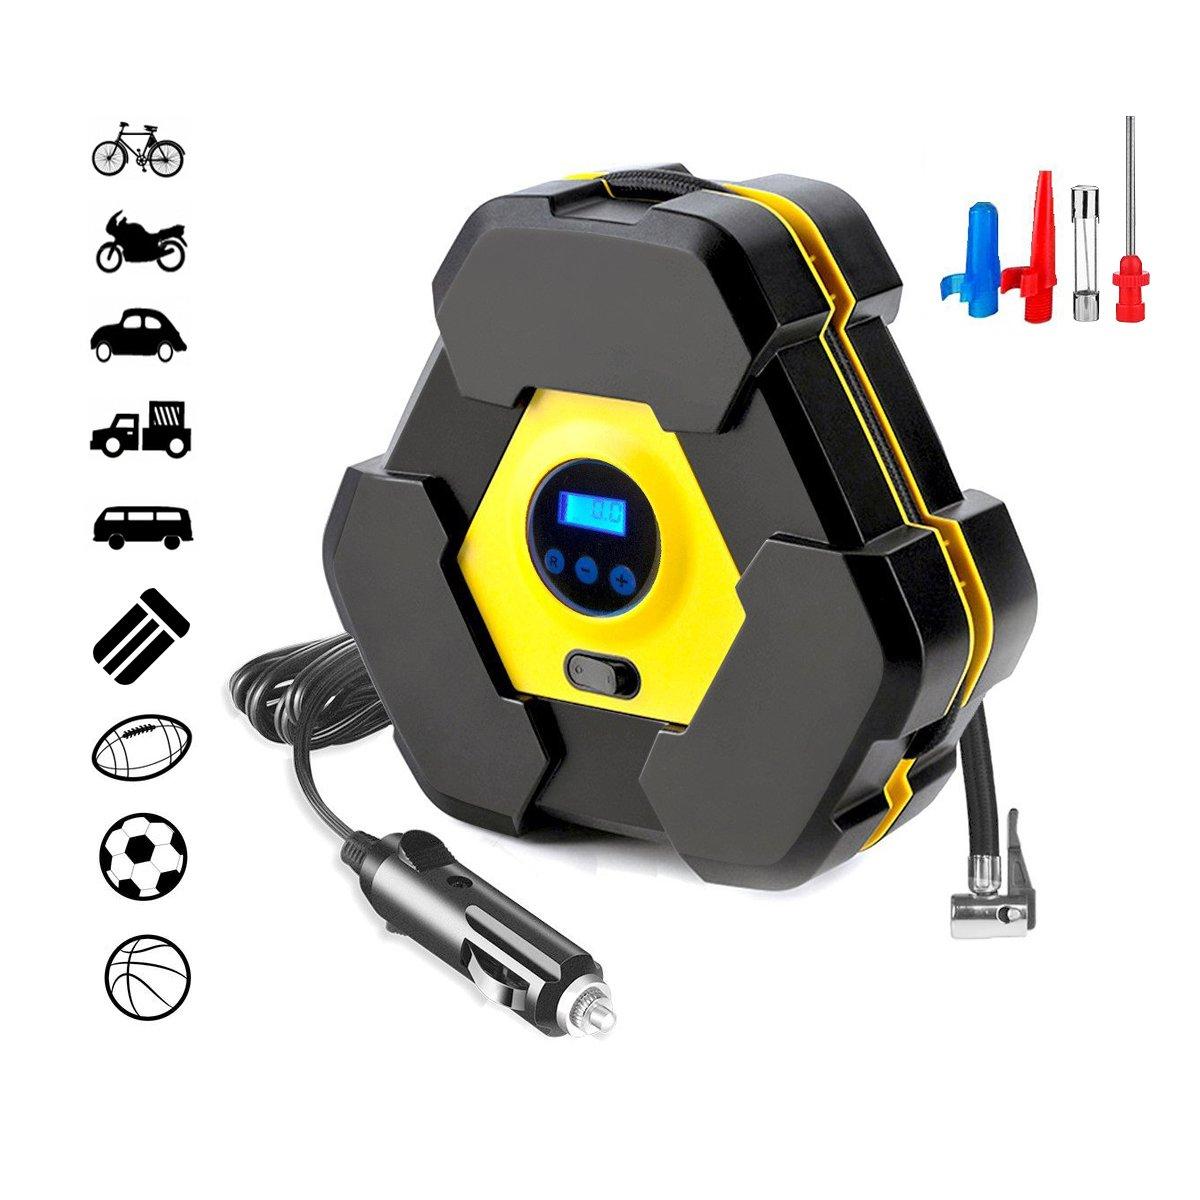 amazon com portable tire inflator pump air compressor 12v for car rh amazon com 12 Volt Relay Wiring Diagrams Wiring 12 Volt Batteries in Series